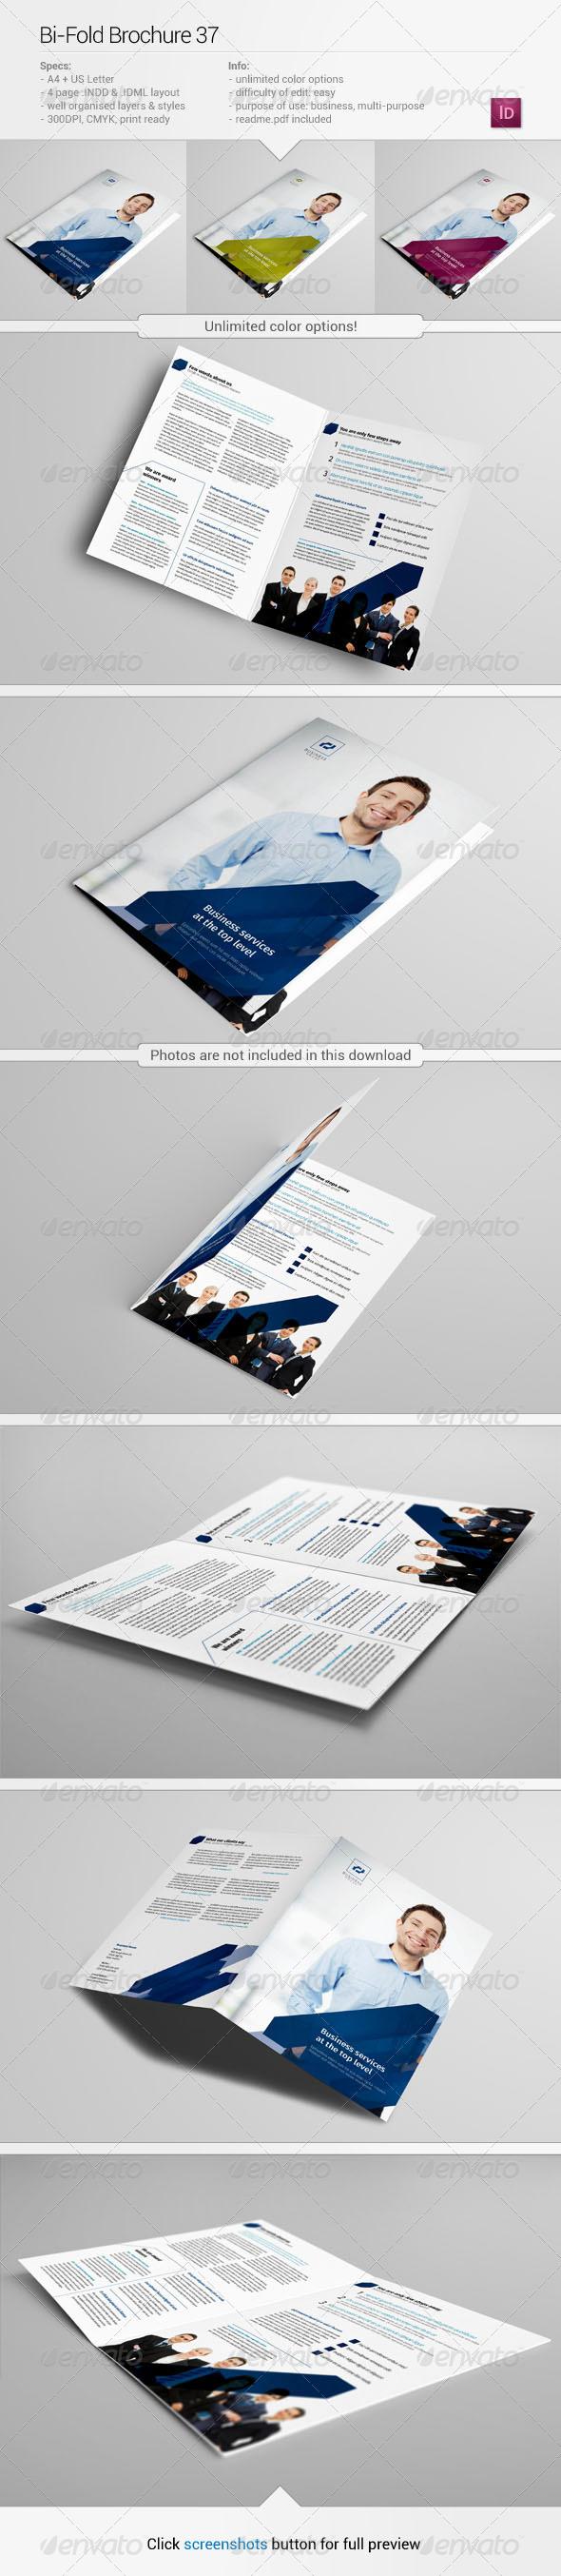 GraphicRiver Bi-Fold Brochure 37 6067794